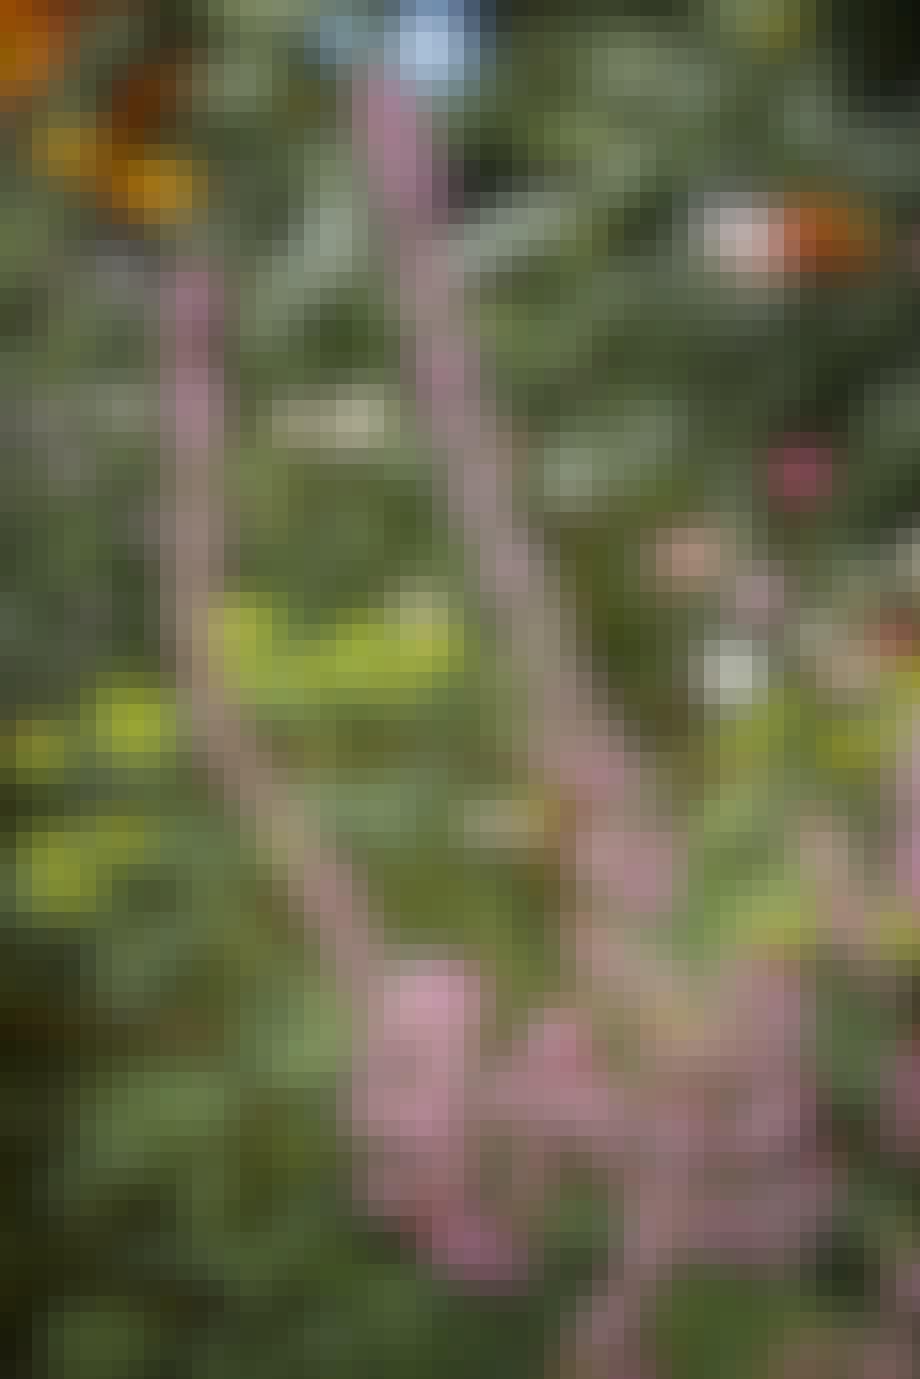 Limonium suworowii